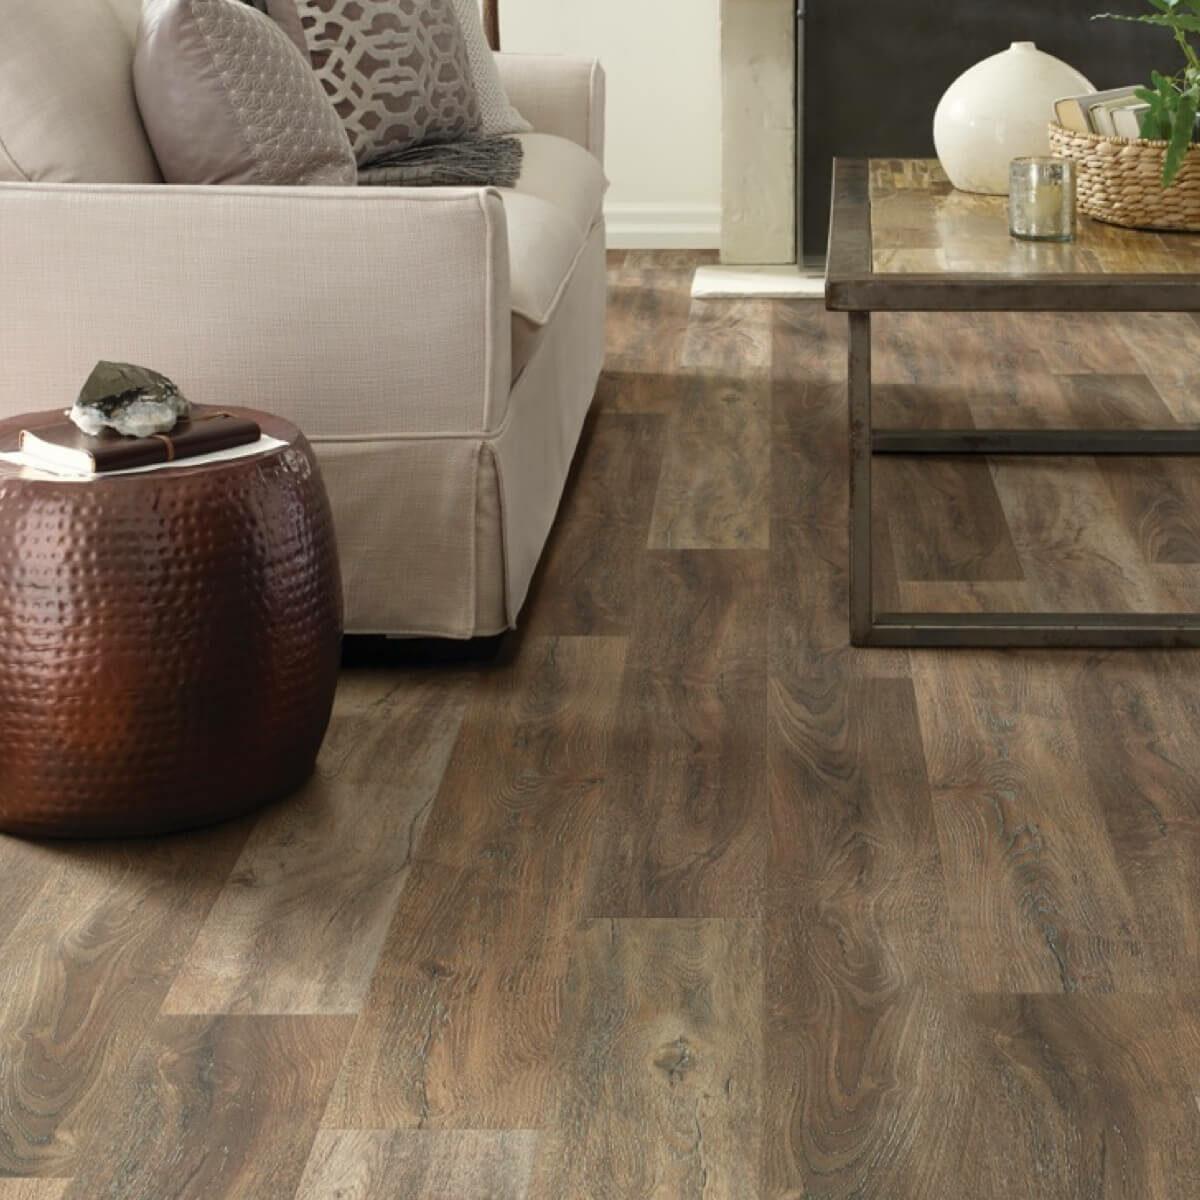 Shaw vinyl flooring | Cherry City Interiors